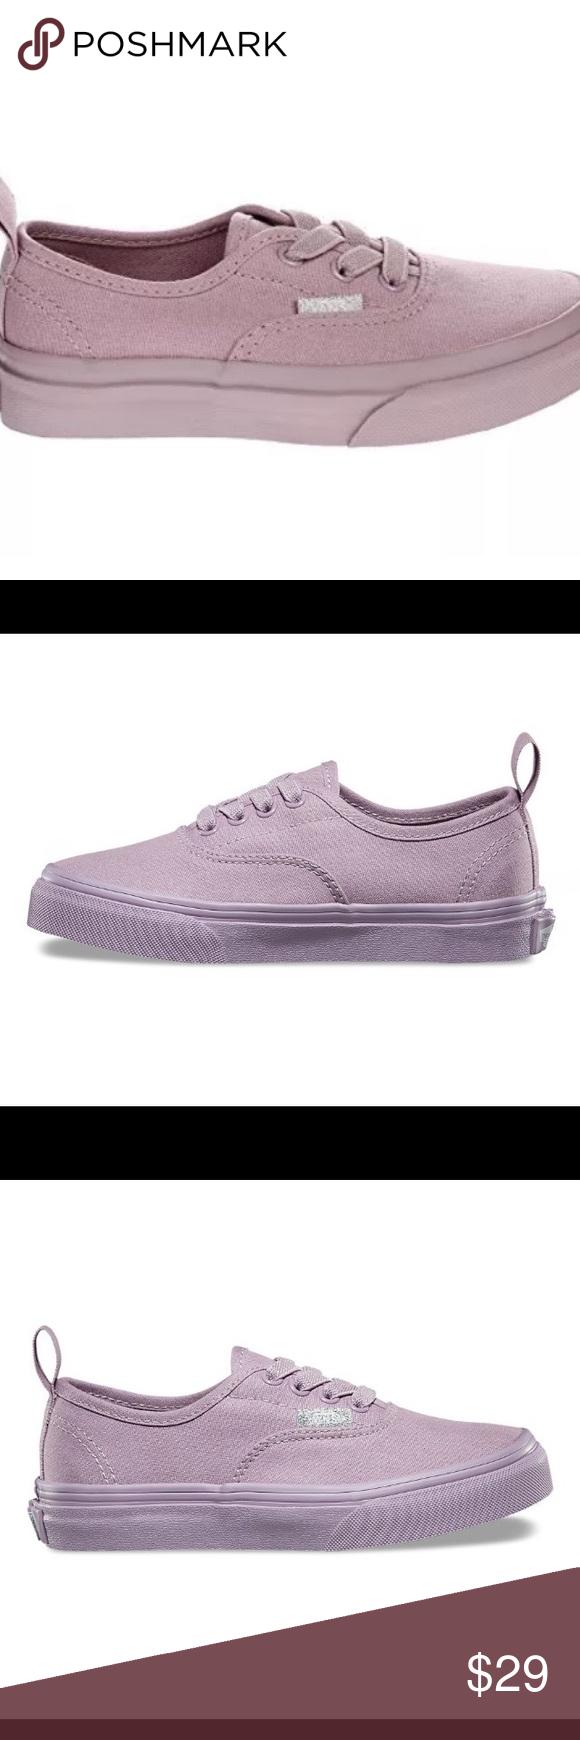 39e09c9165 Vans Authentic Kids Elastic Mono Sea Fog Shoes Authentic elastic ...